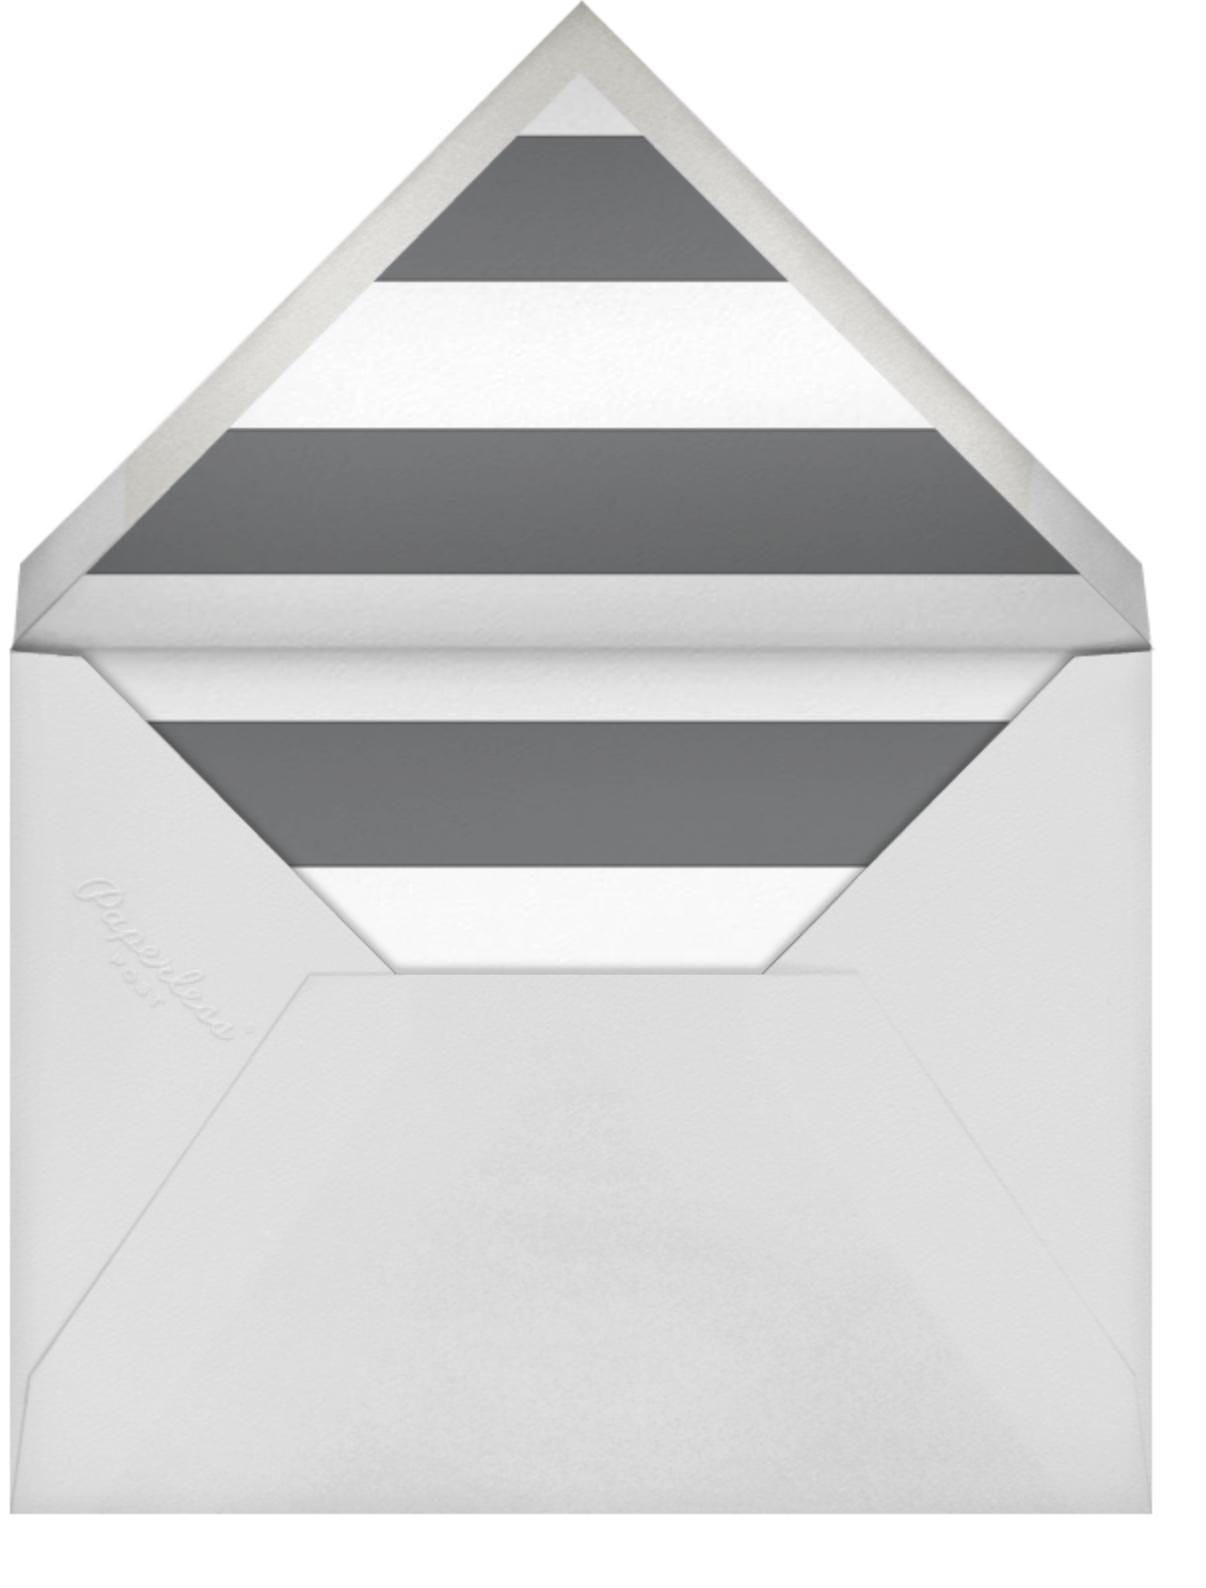 Big Dot Rehearsal (Photo) - Silver - Sugar Paper - Envelope